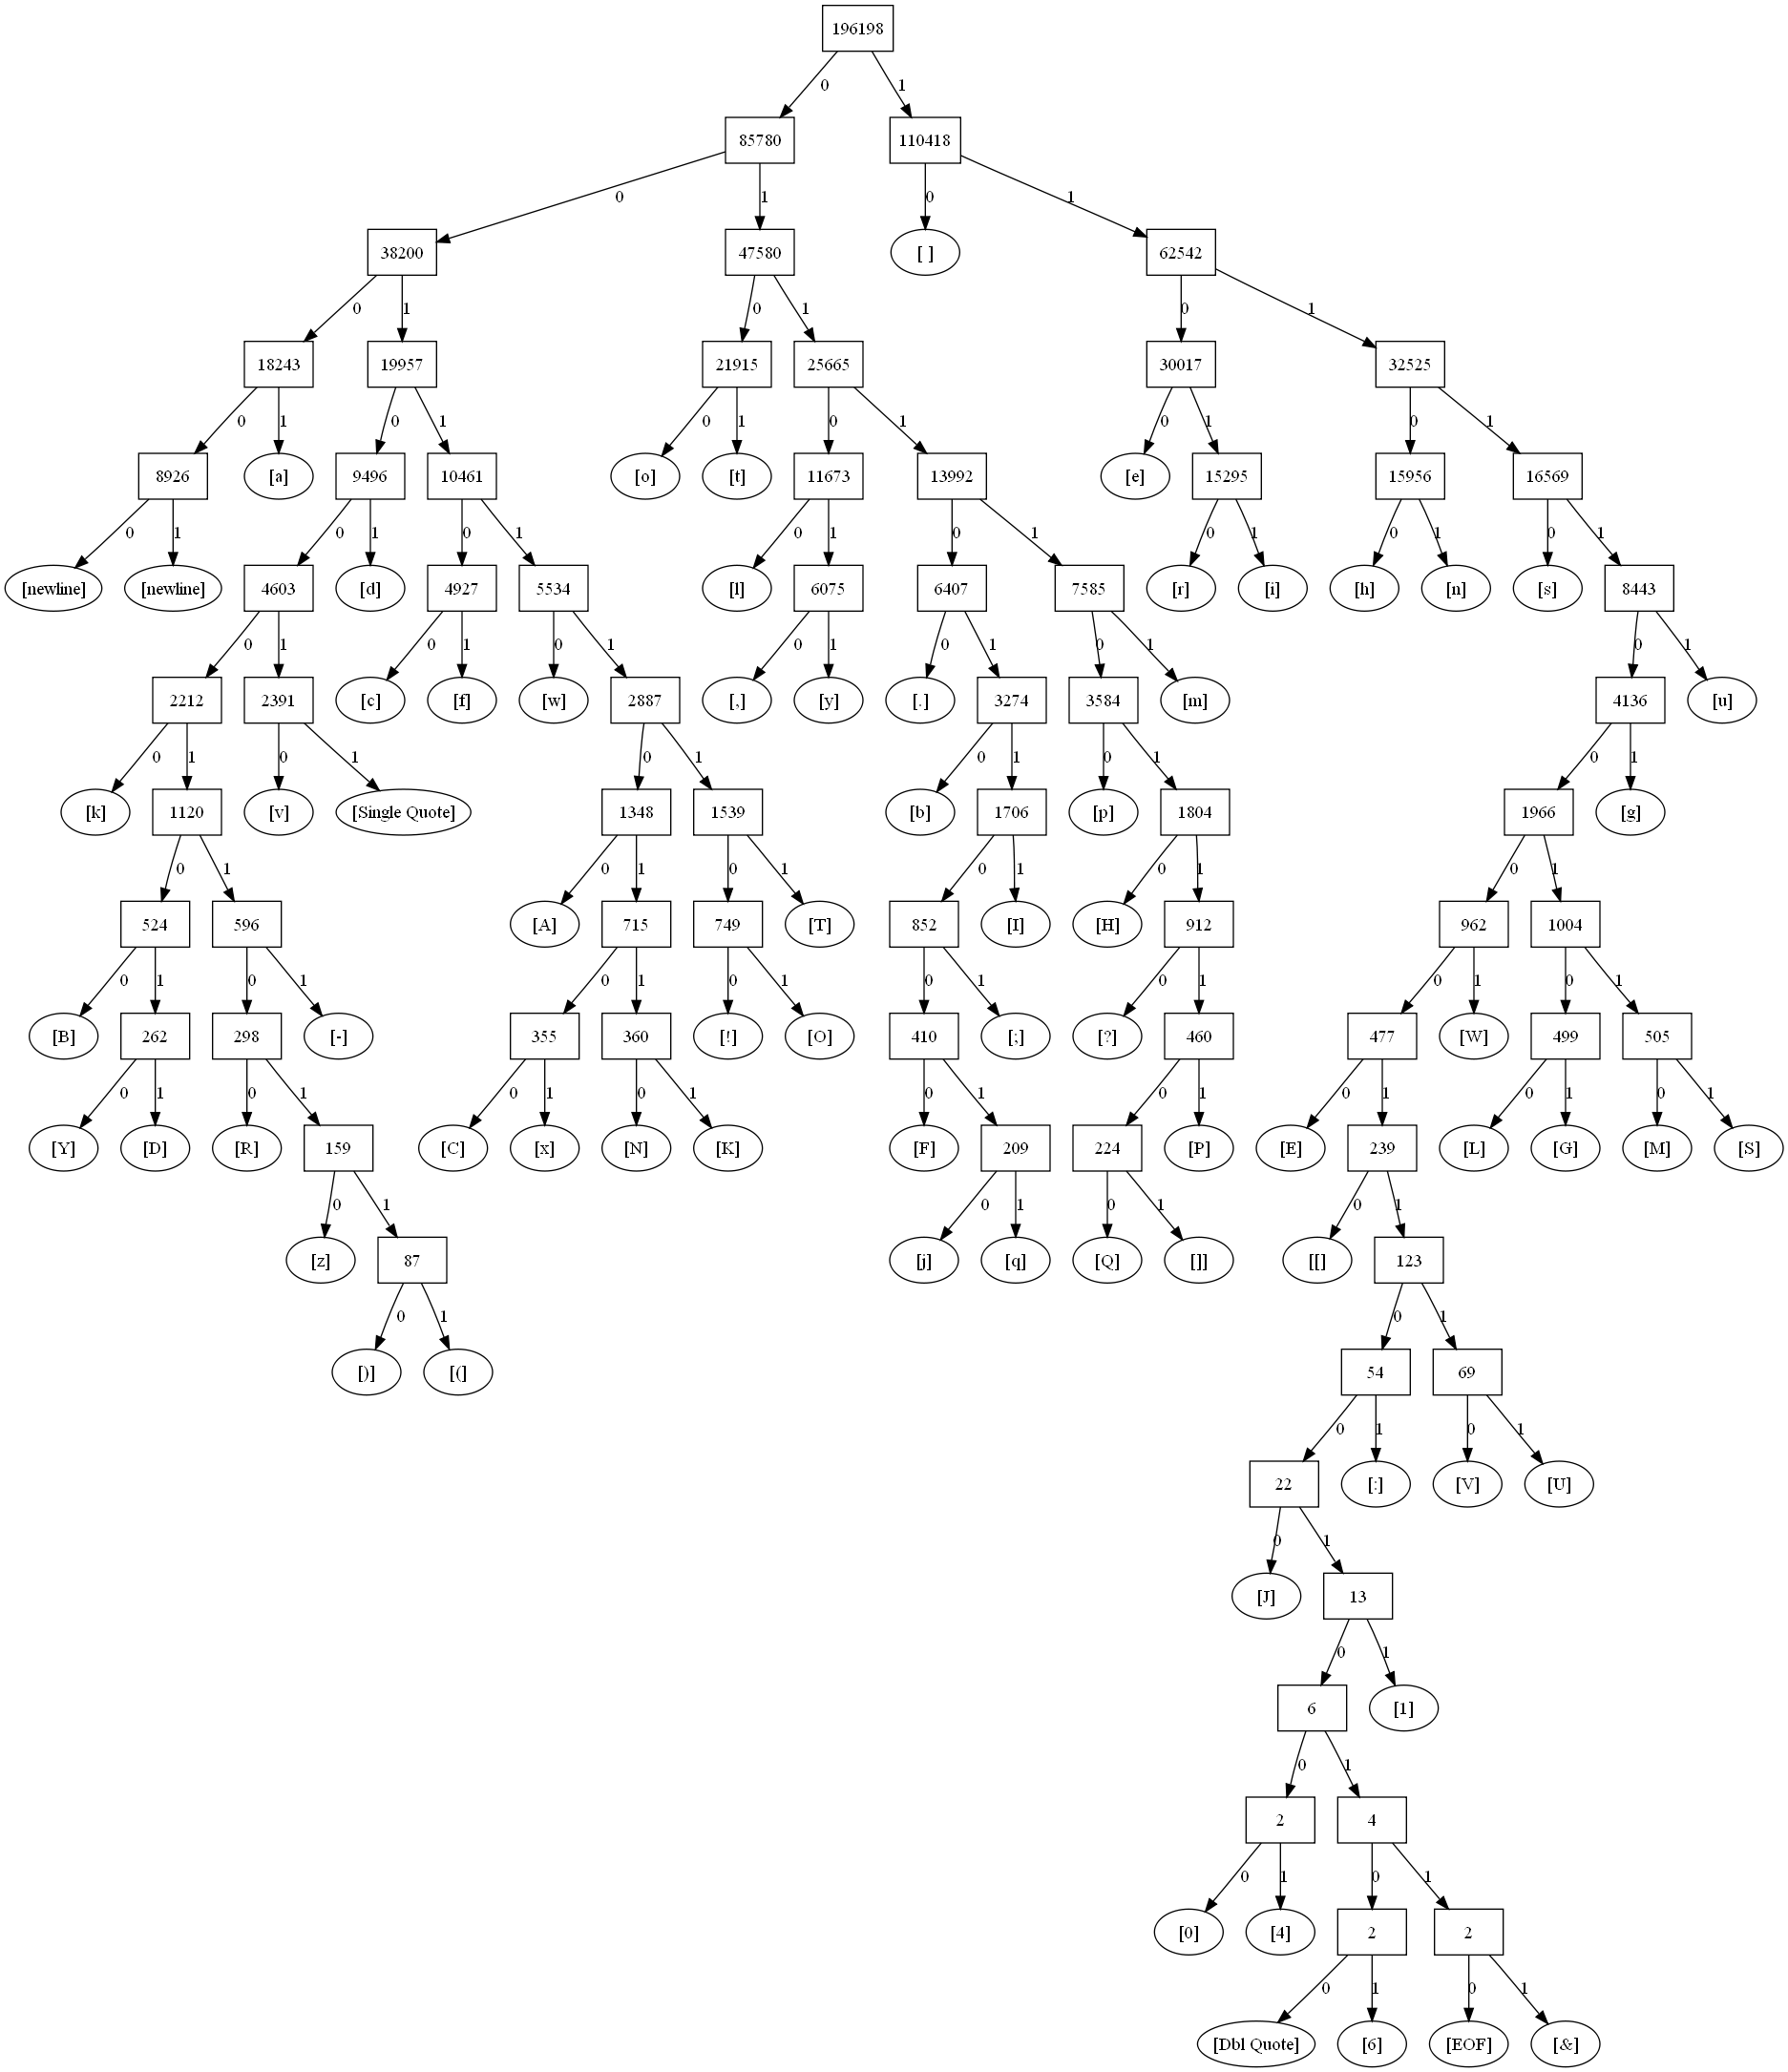 Cse 143 spring 2013 hamlet tree diagram ccuart Images